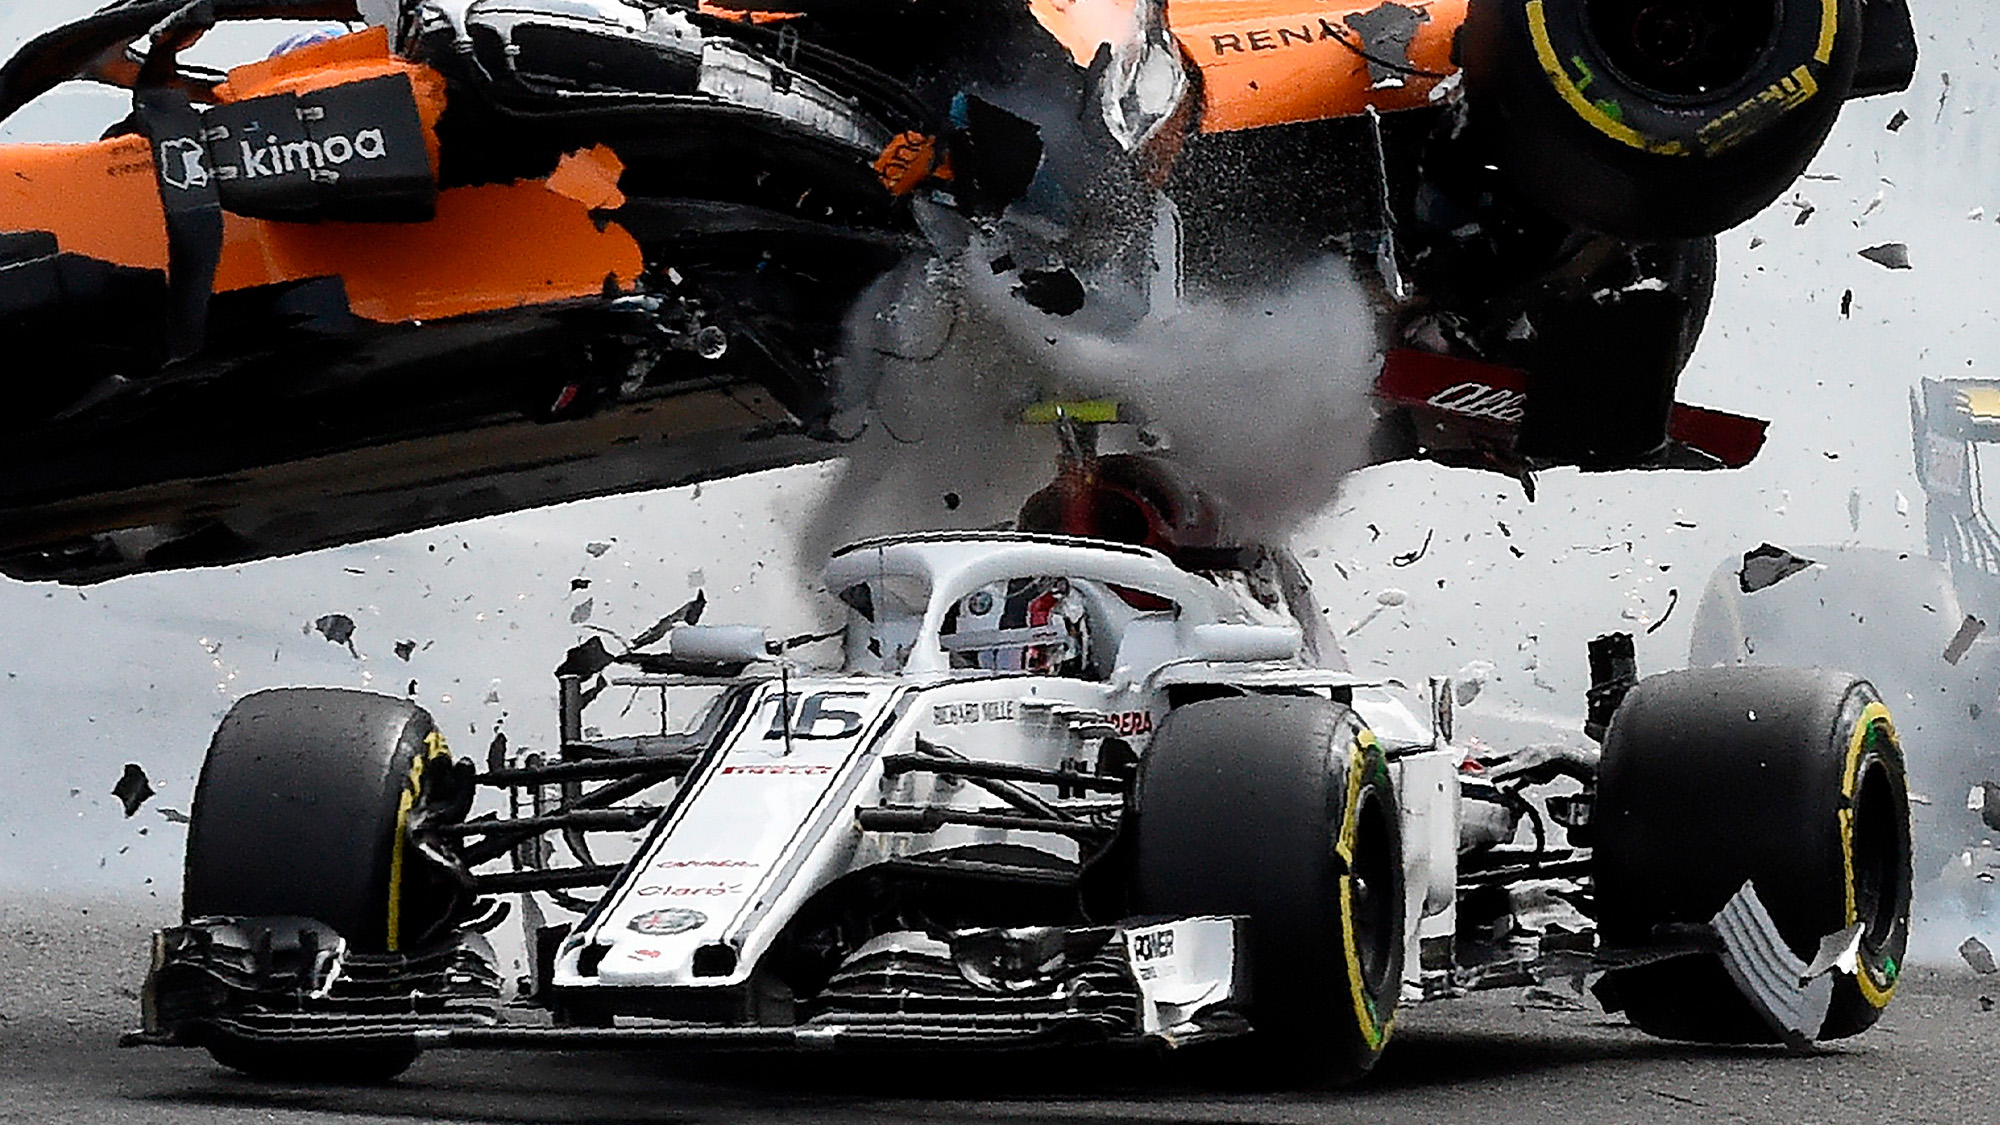 Fernando Alonso's McLaren flies over the Alfa Romeo of Charles Leclerc at the 2018 Belgian Grand Prix